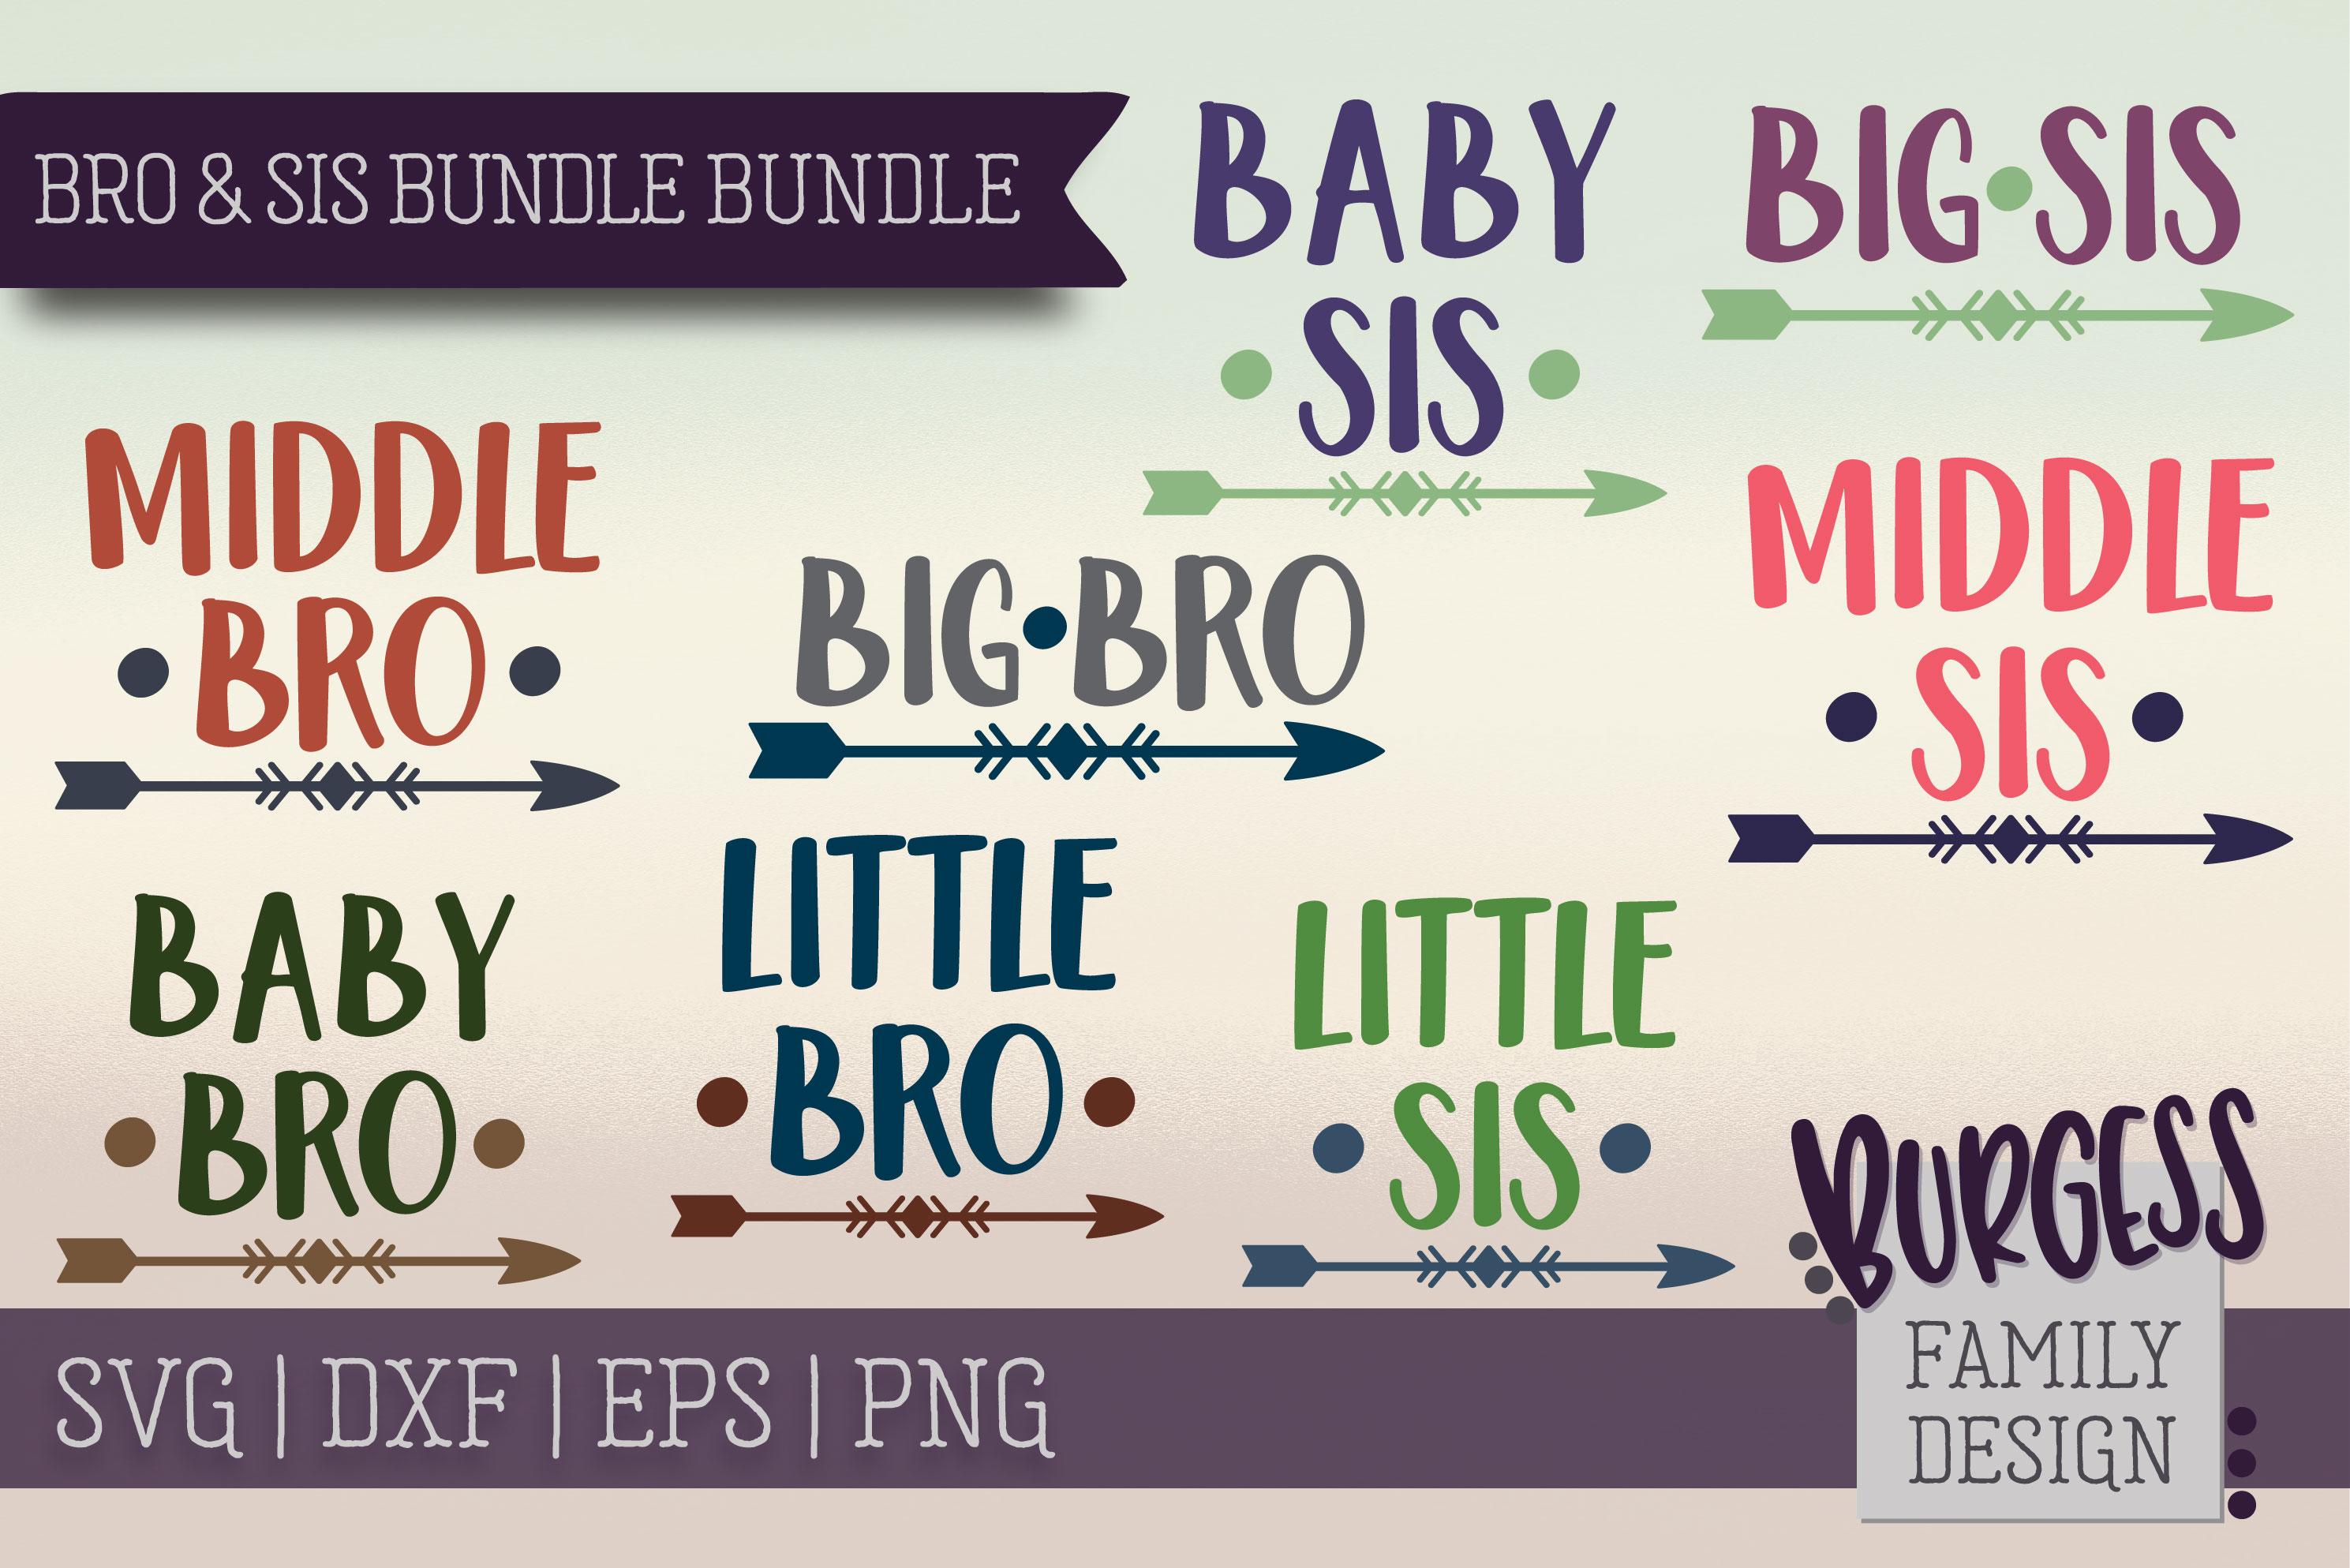 The starter bundle - Over 200 Designs | SVG DXF EPS PNG example image 3